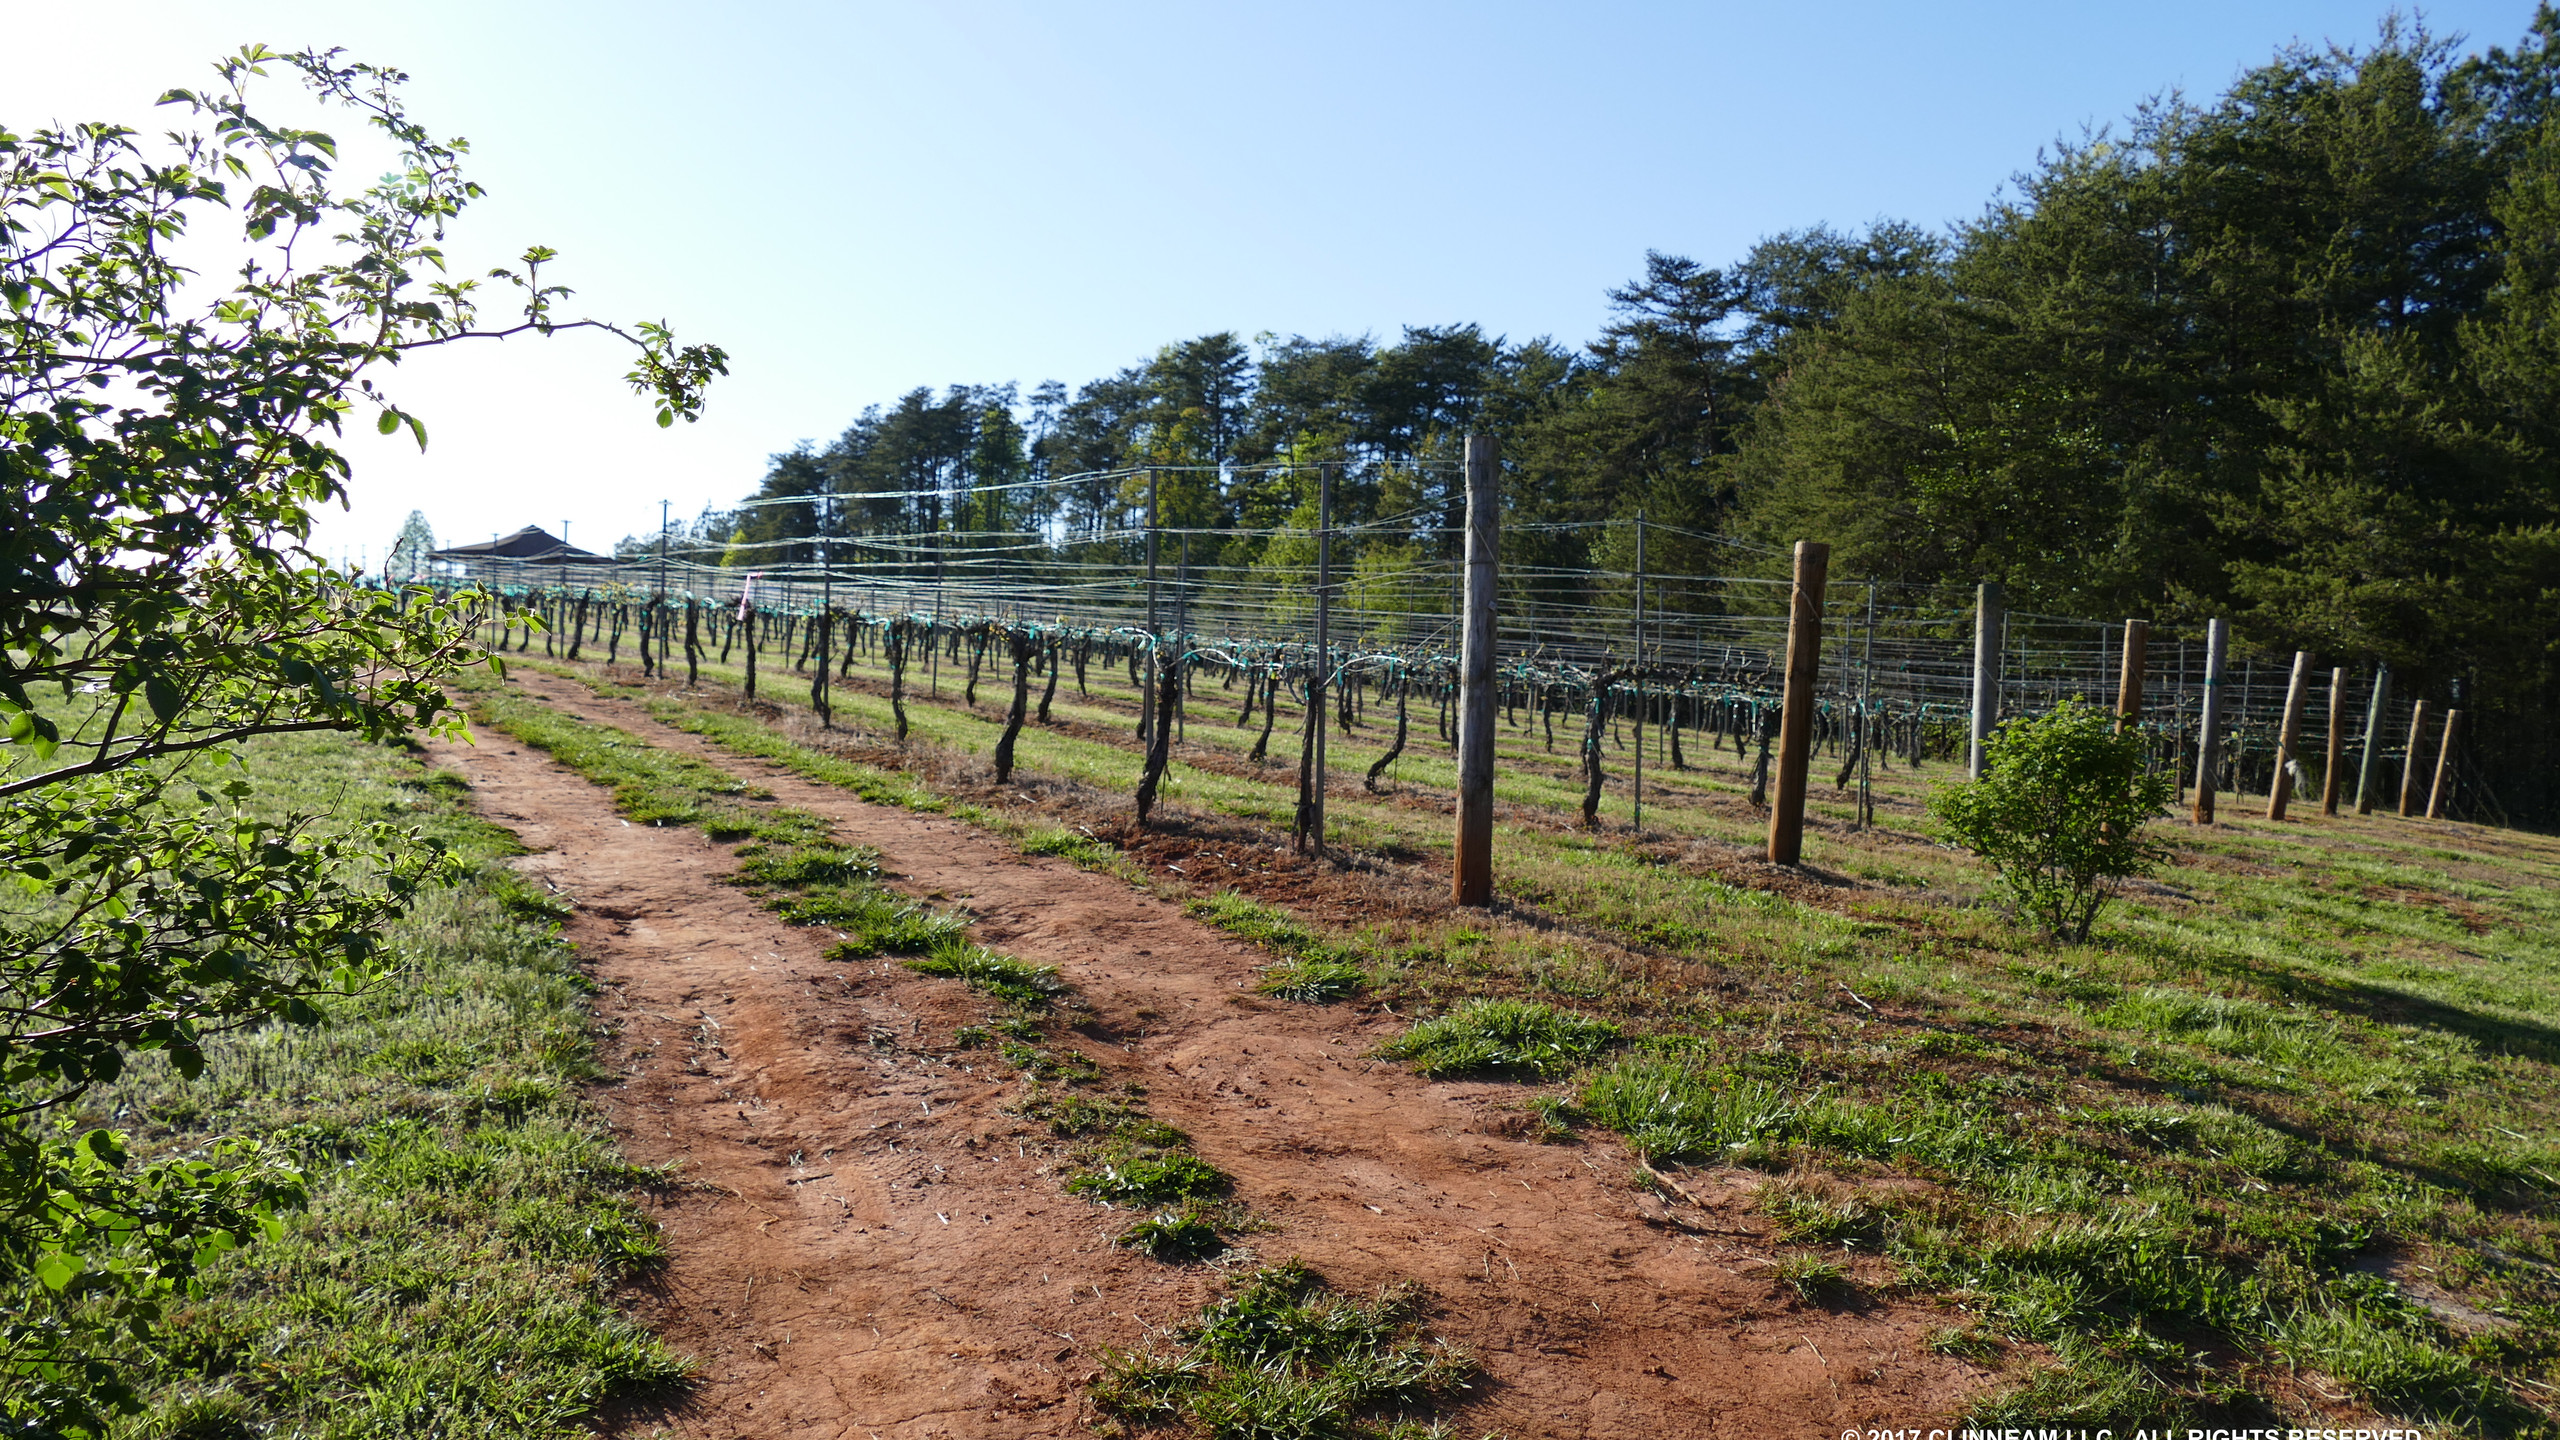 MBV's Vines